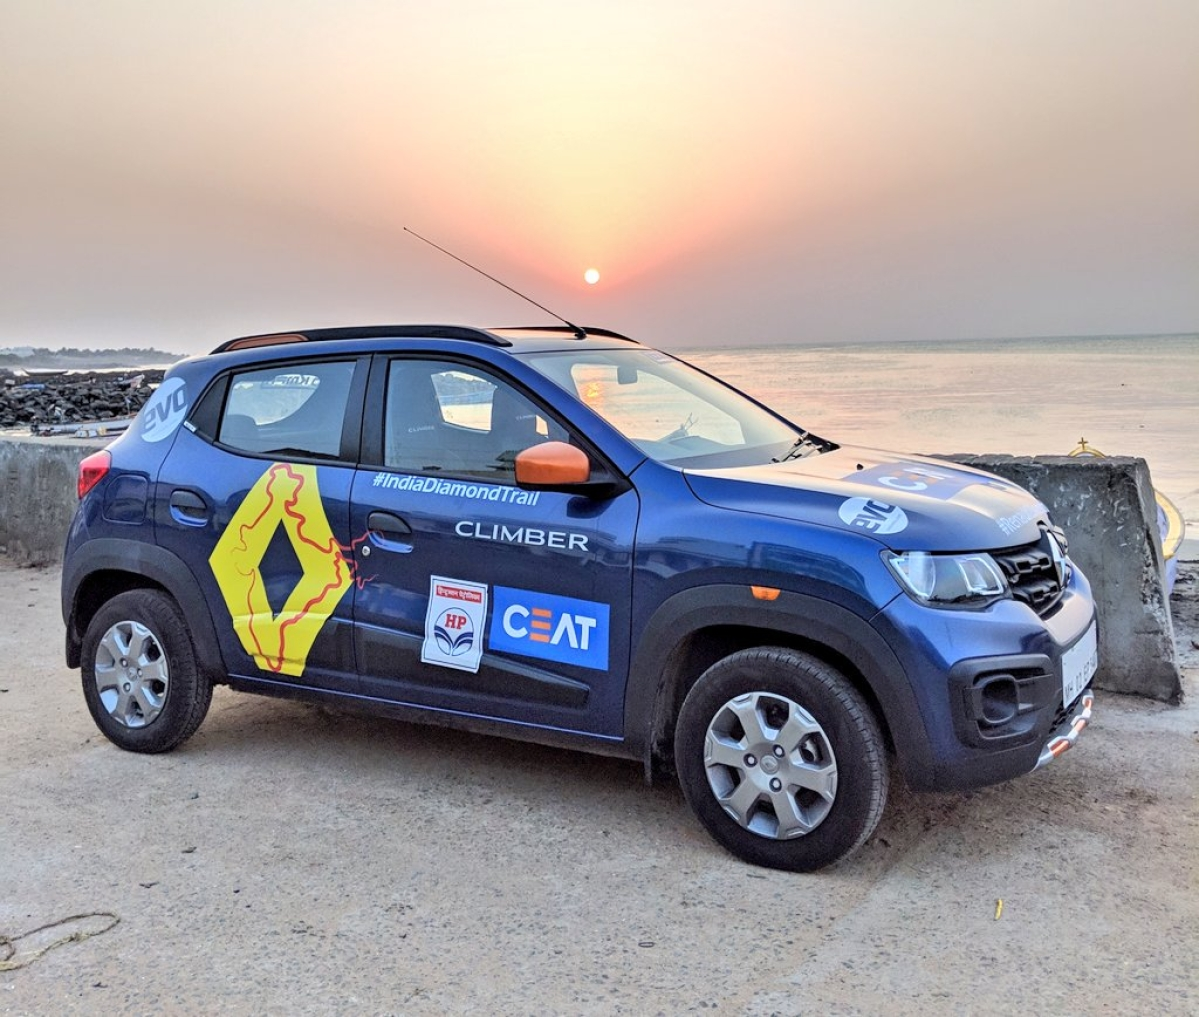 Day 10 – Renault India Diamond Trail – A day in Kanyakumari